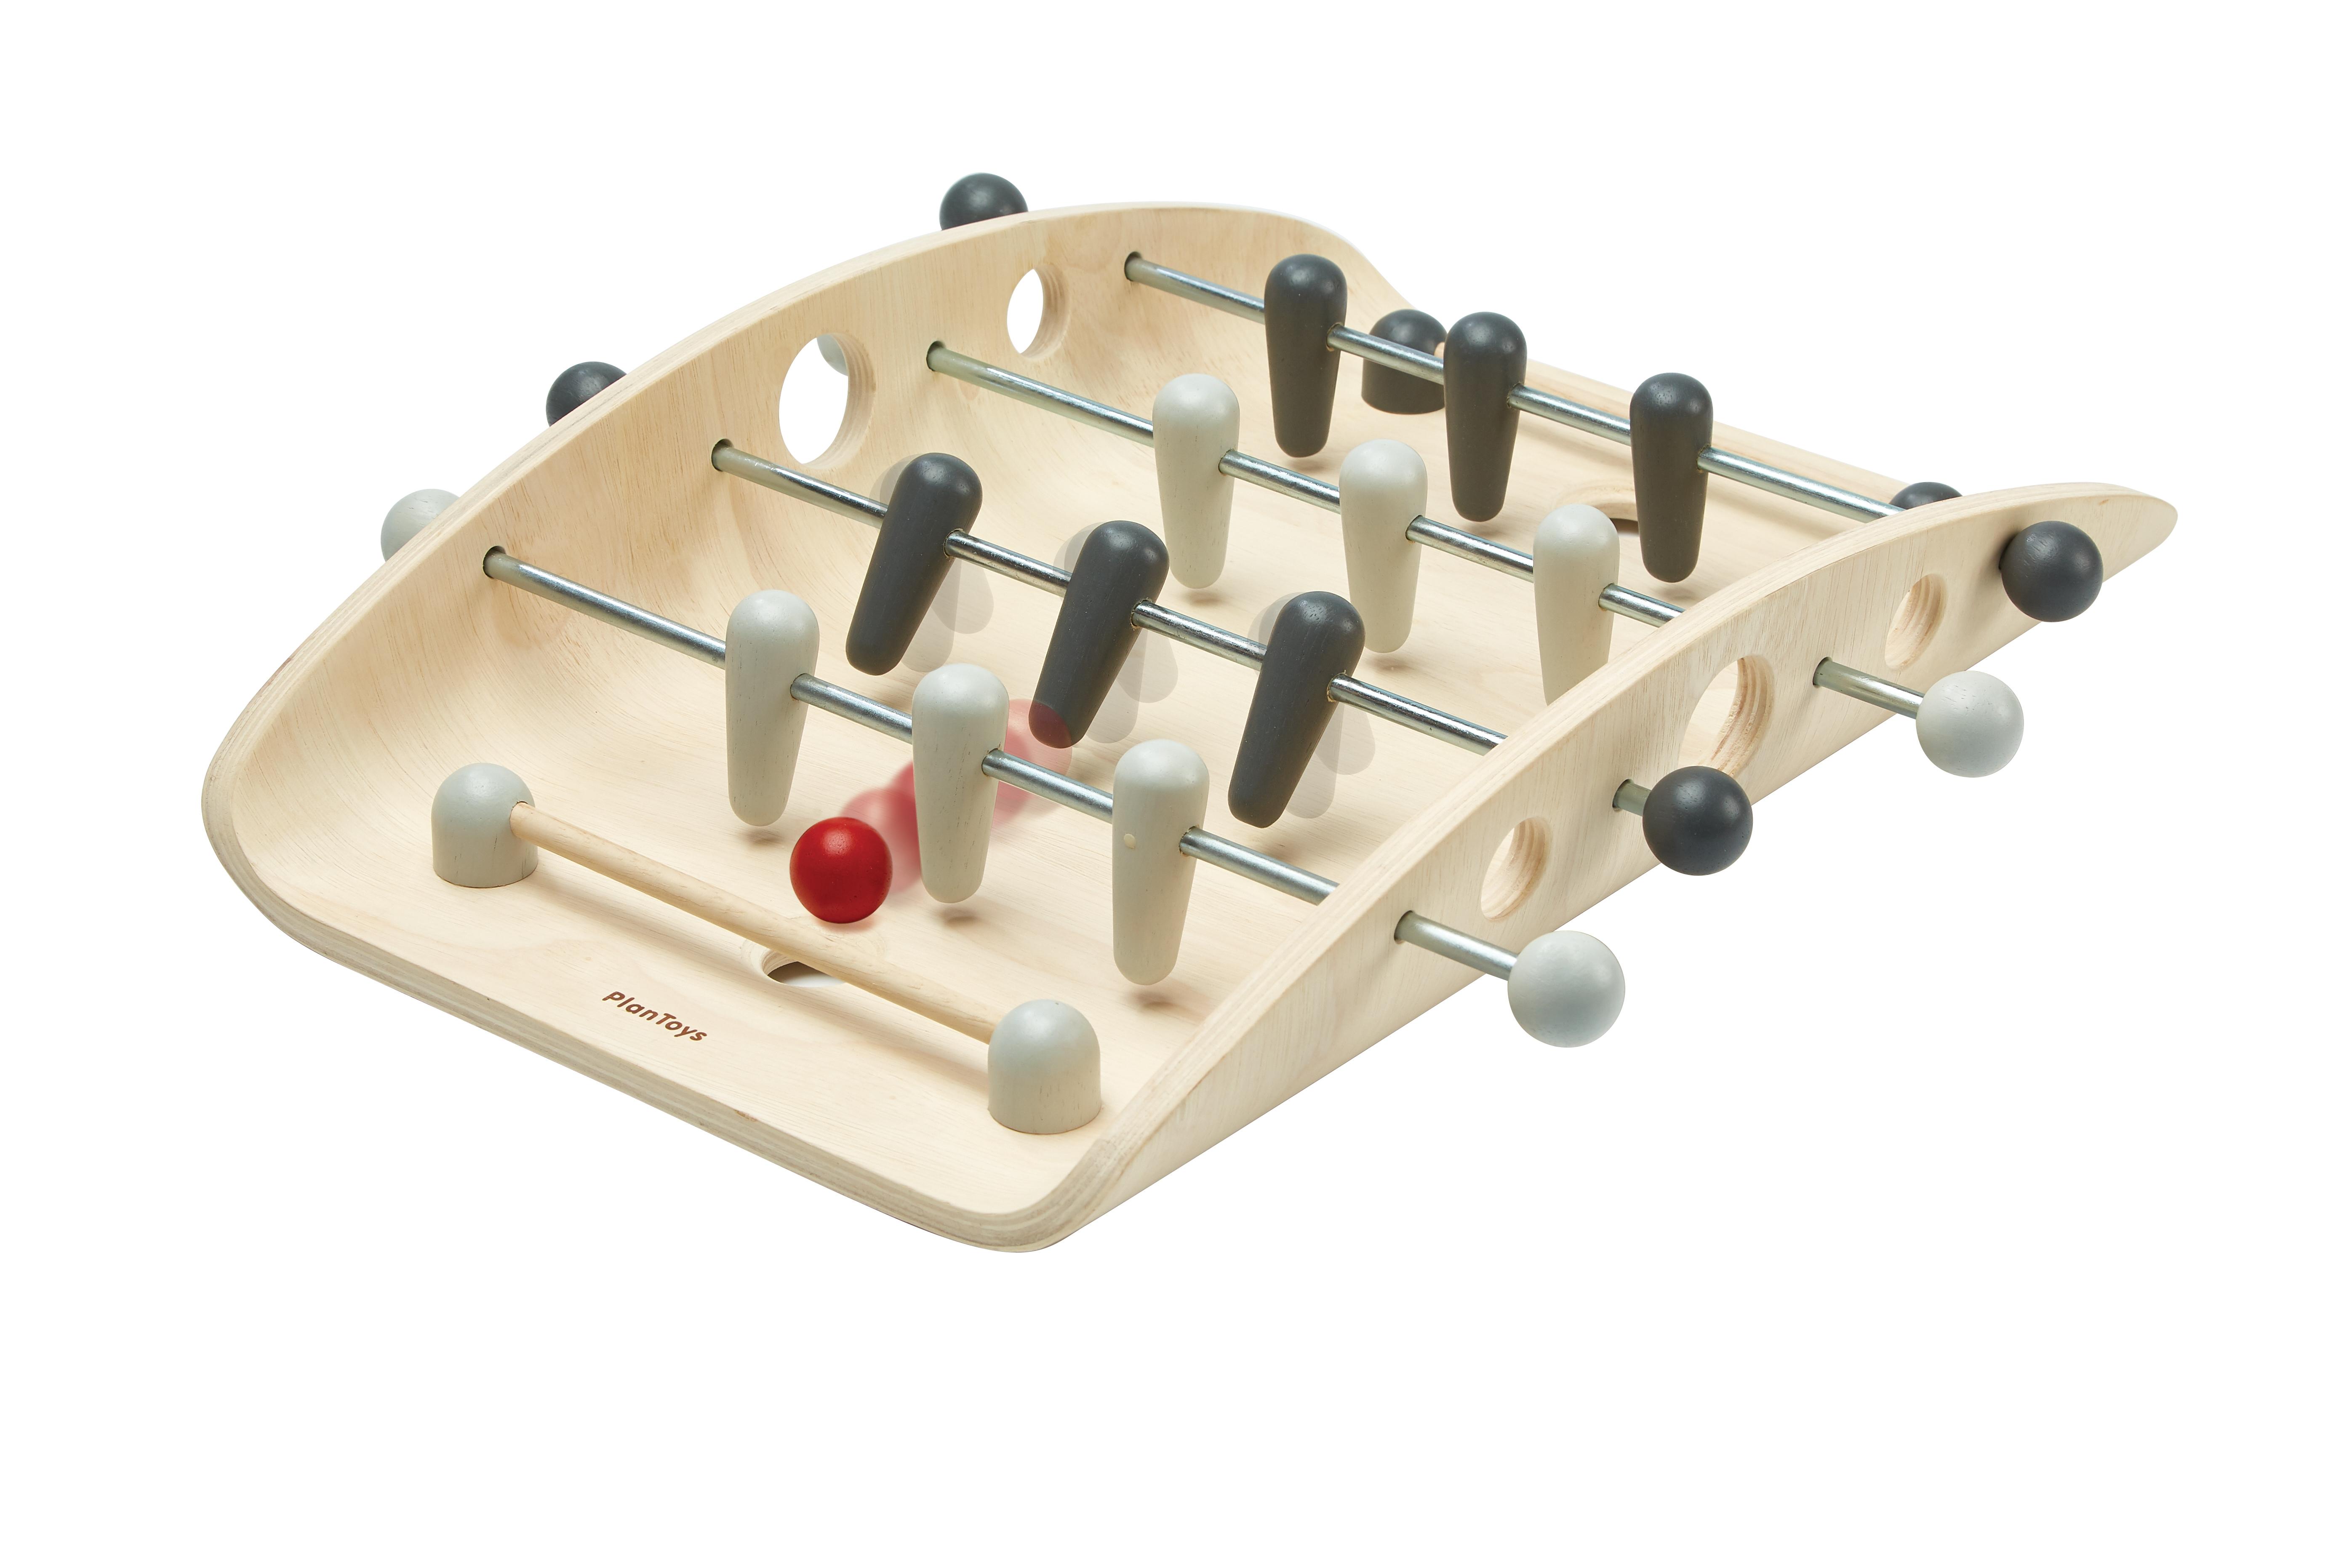 Joc Foosball - Joc de fotbal din lemn copii 0